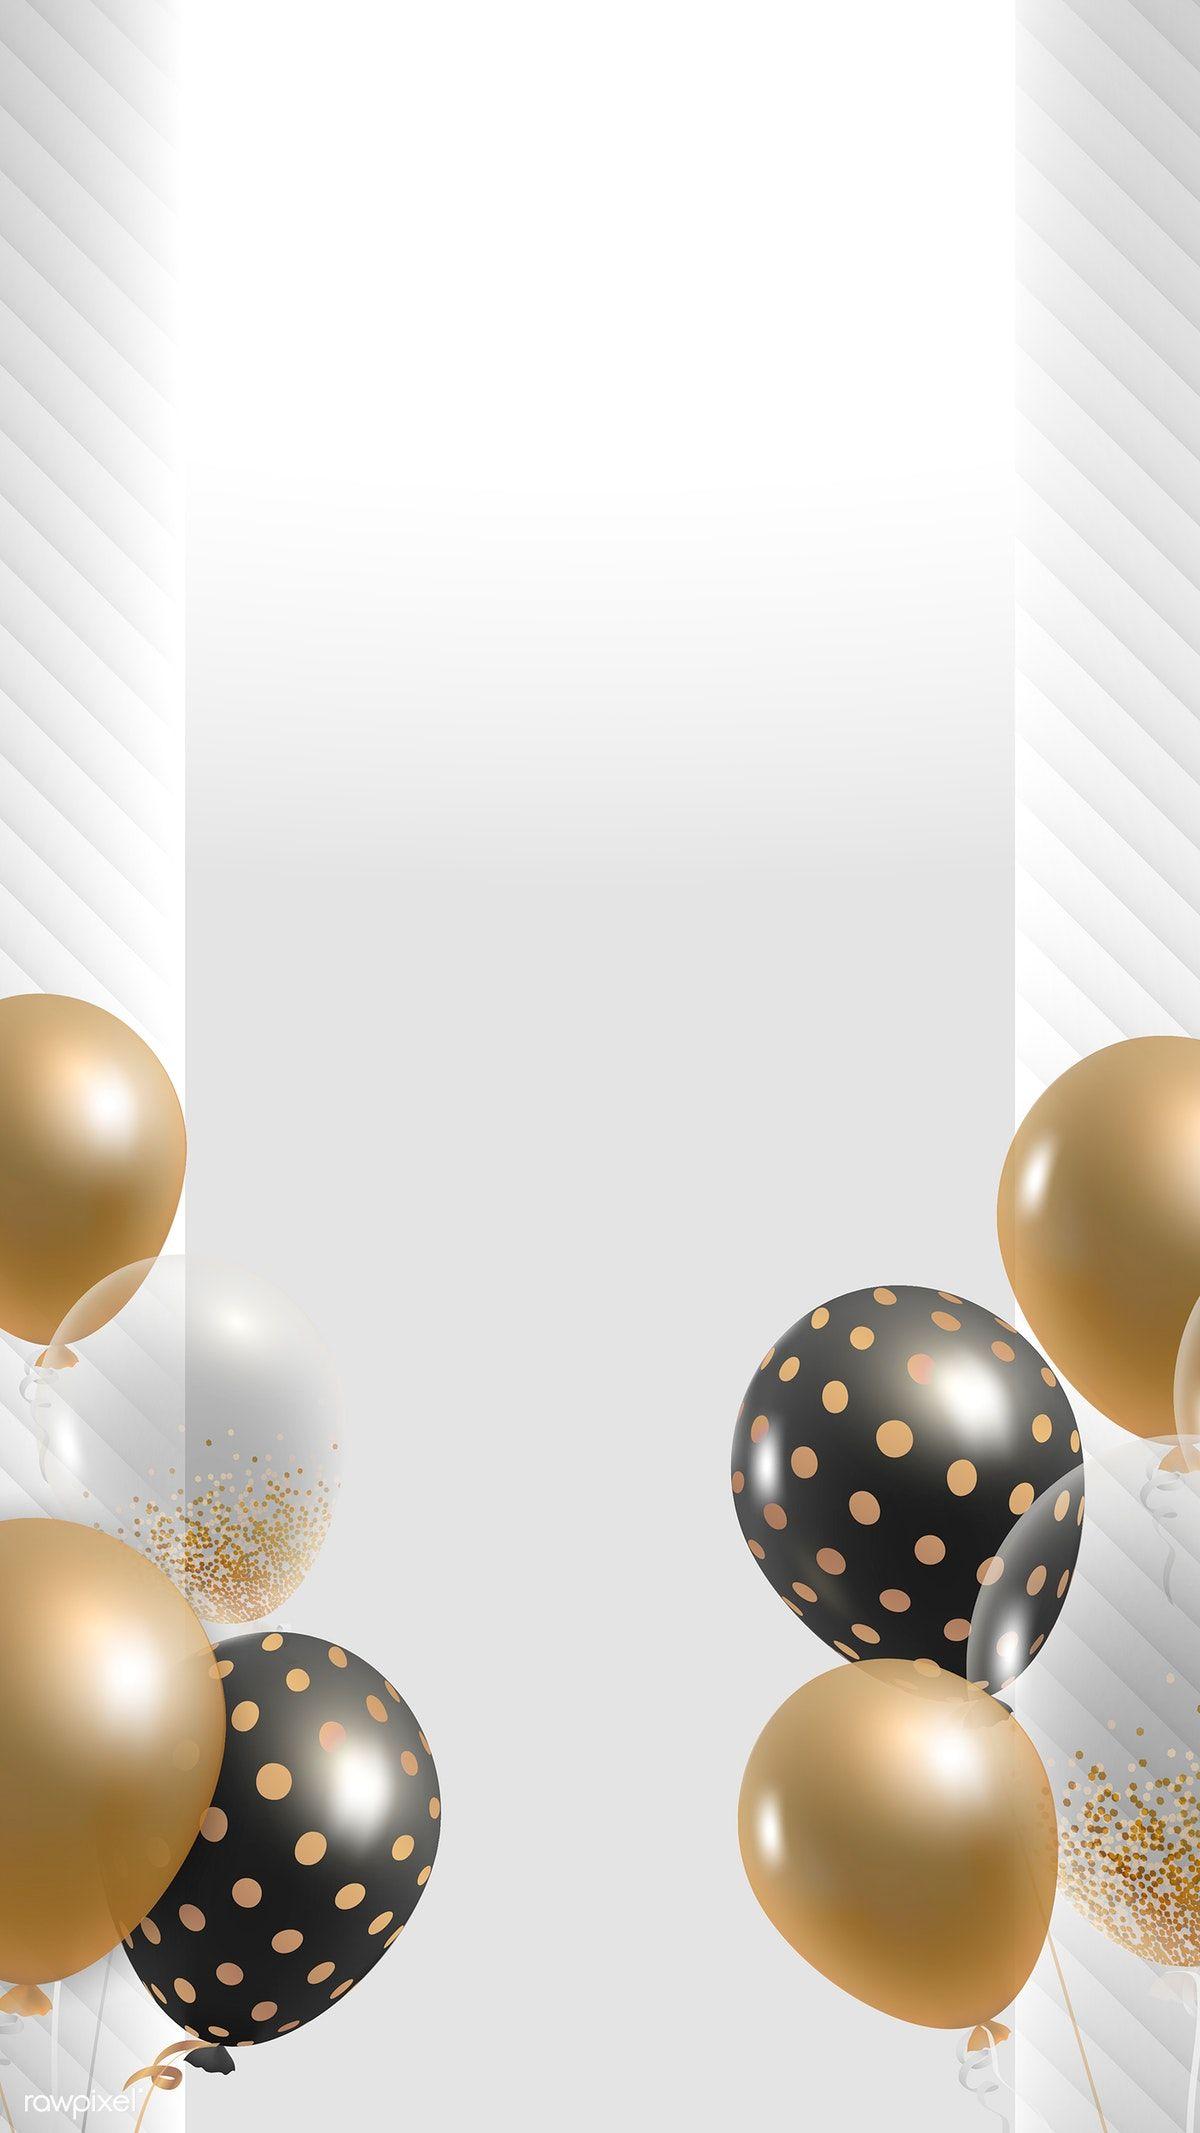 Download premium vector of Elegant balloons frame design mobile 1200x2133